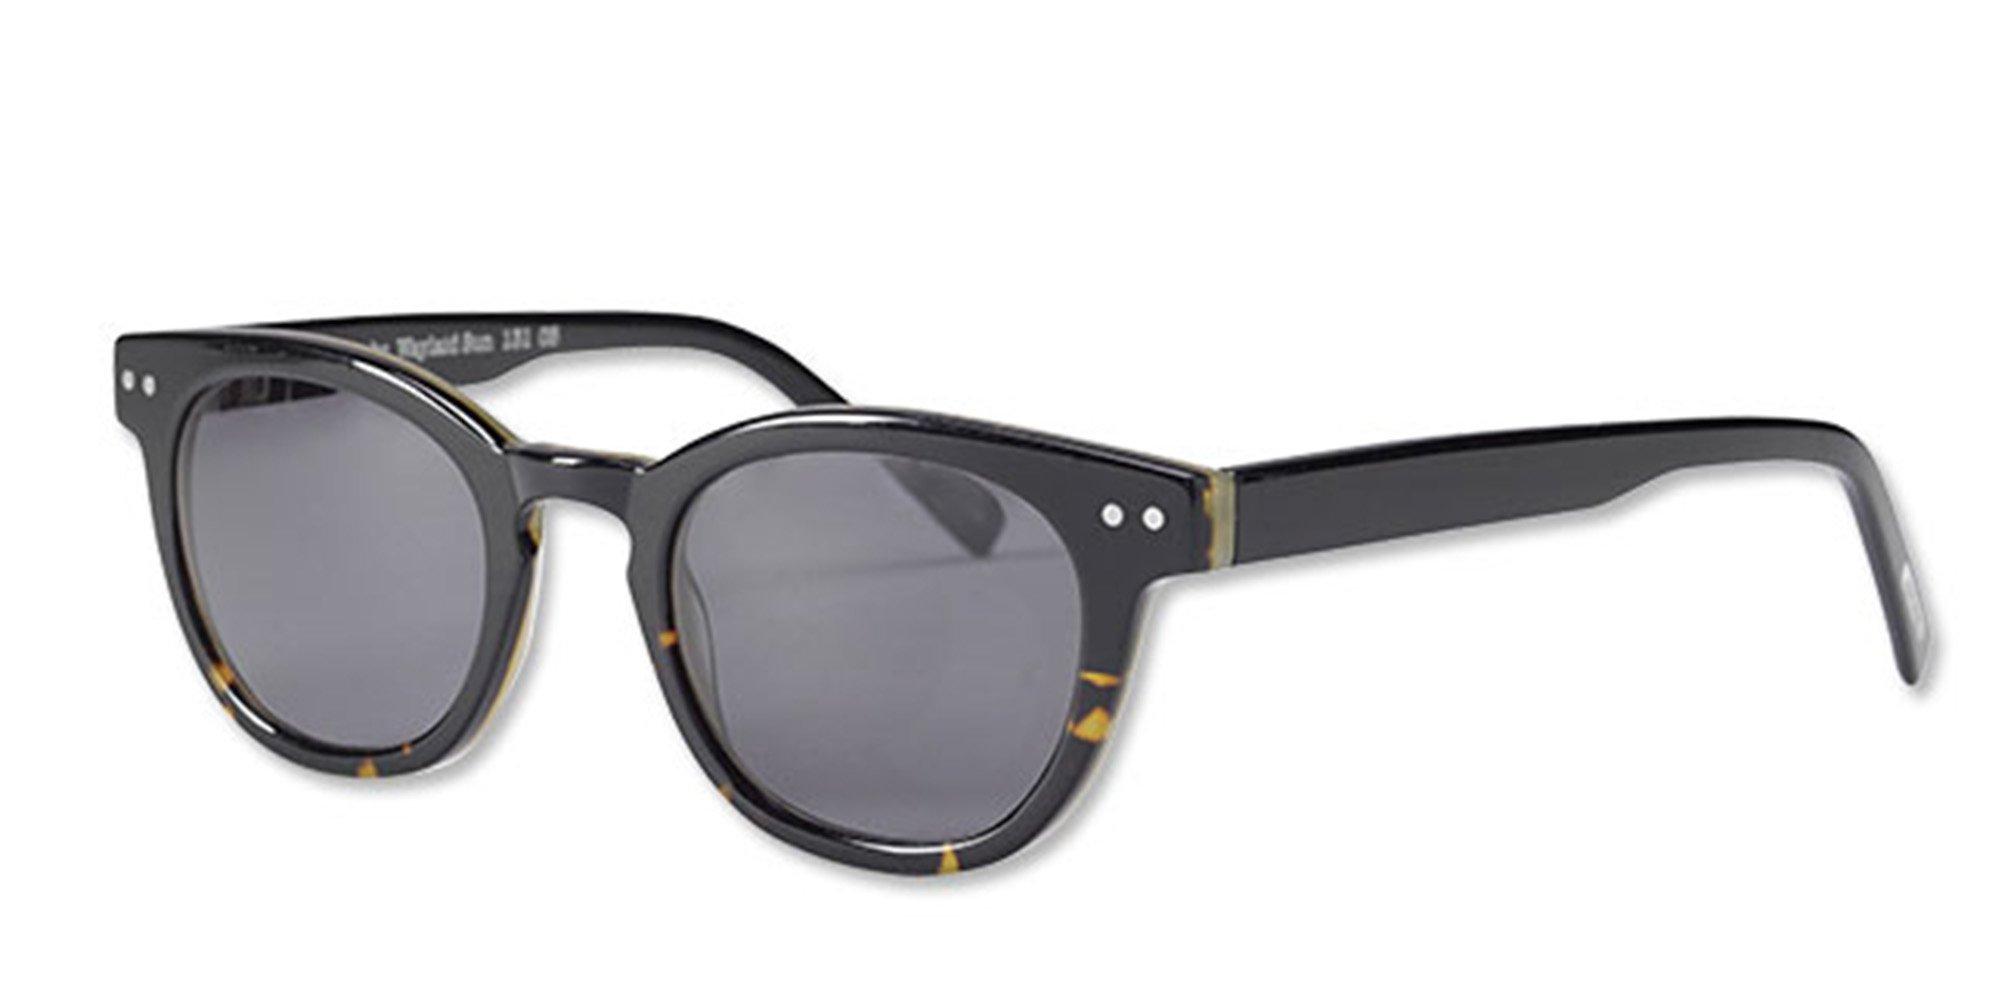 Orvis Men's All-Day Reader Sunglasses, Black, Magnification: 2.00X